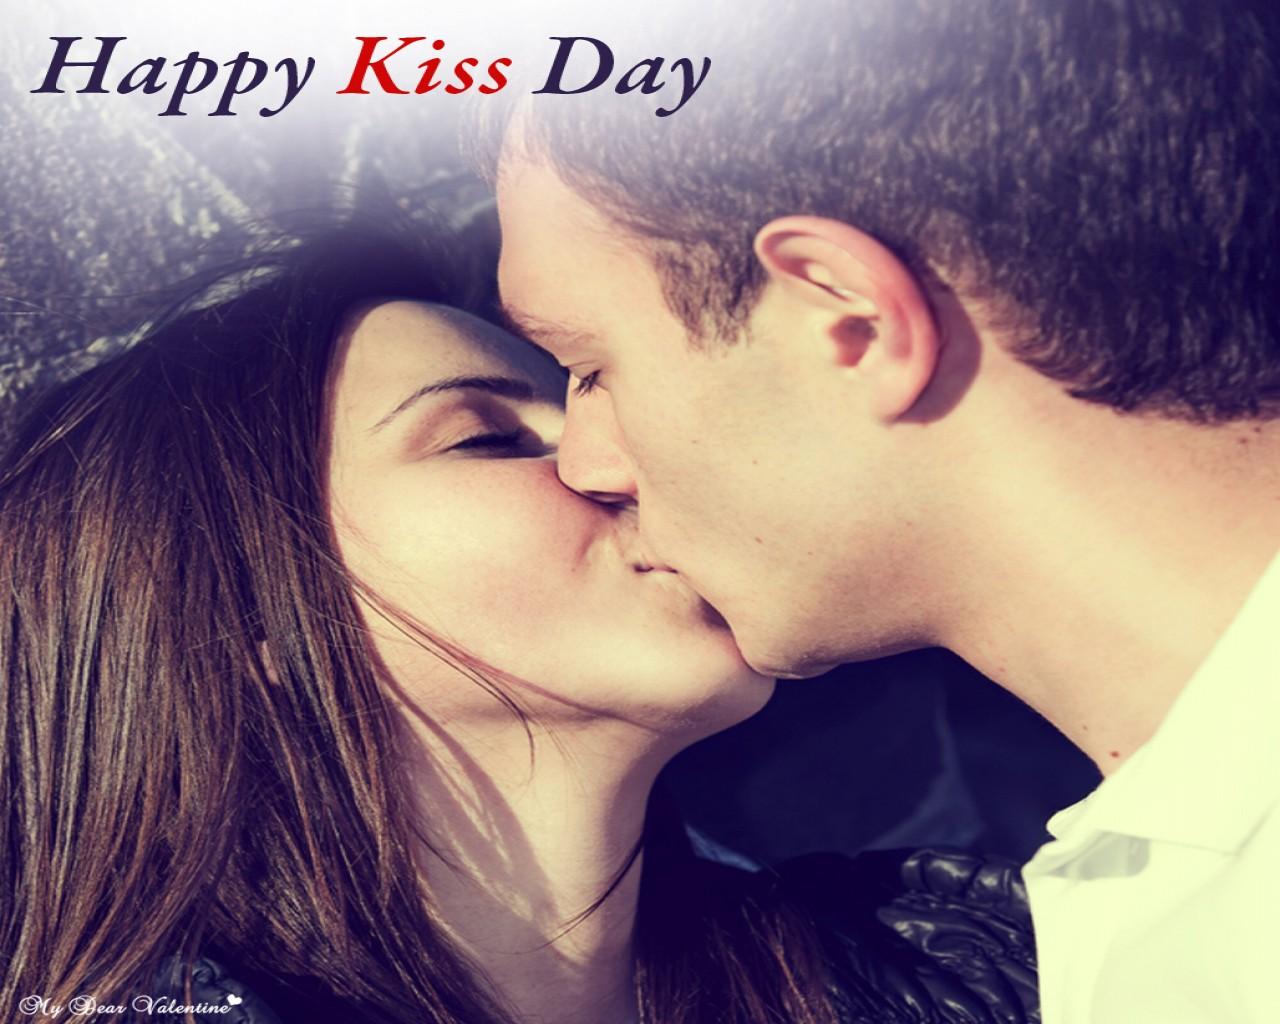 Romantic Kiss Wallpaper Free Download 192516 Hd Wallpaper